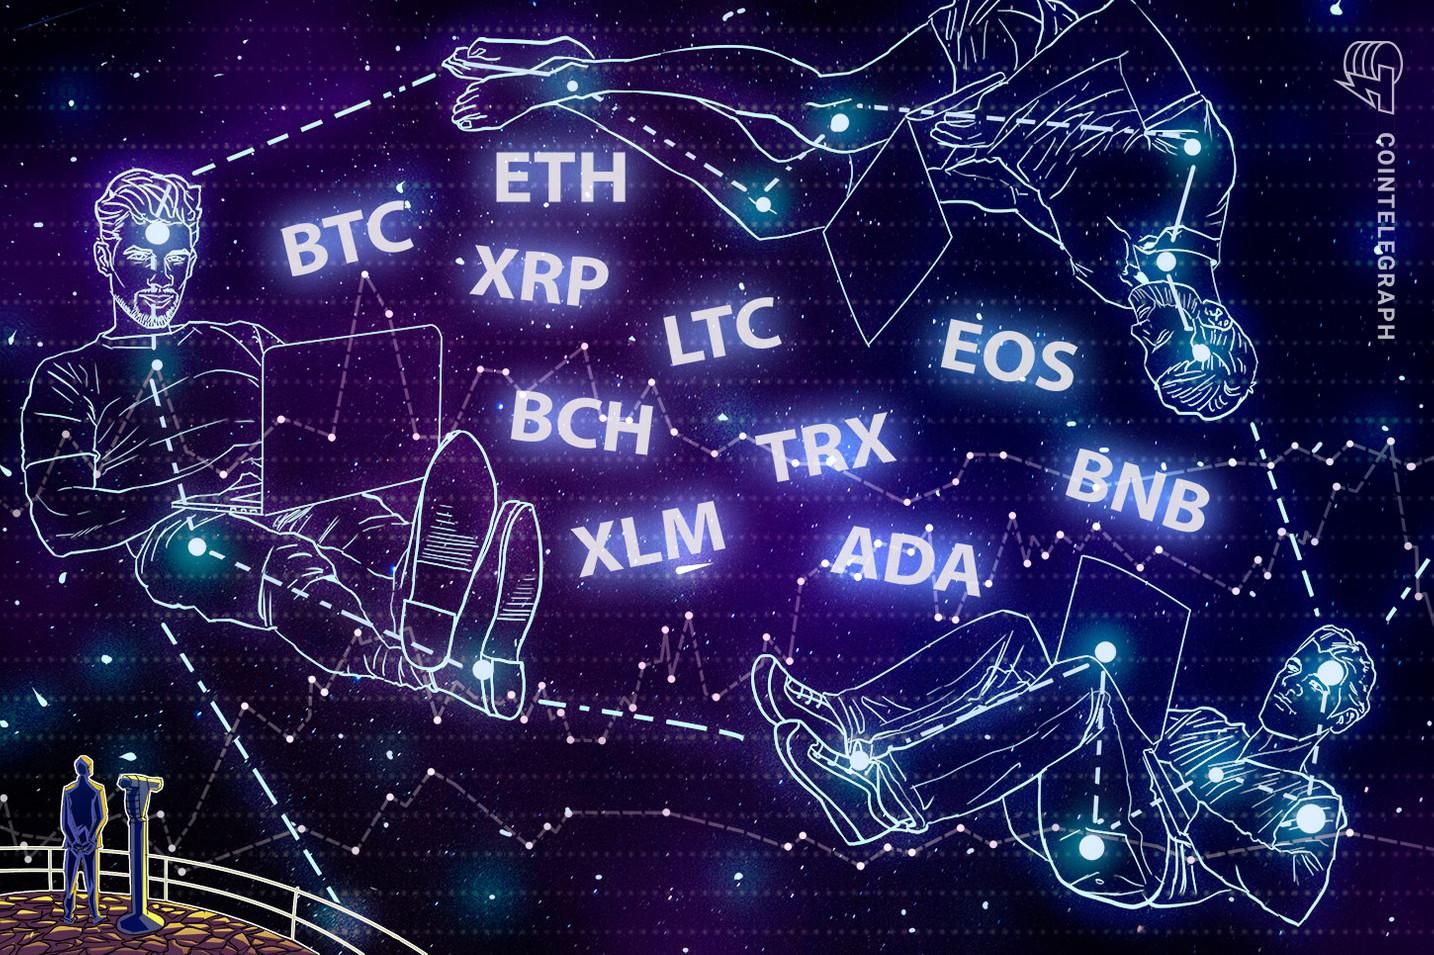 Bitcoin, Ethereum, Ripple, Litecoin, EOS, Bitcoin Cash, Binance Coin, Stellar, Cardano, TRON: Price Analysis April 12